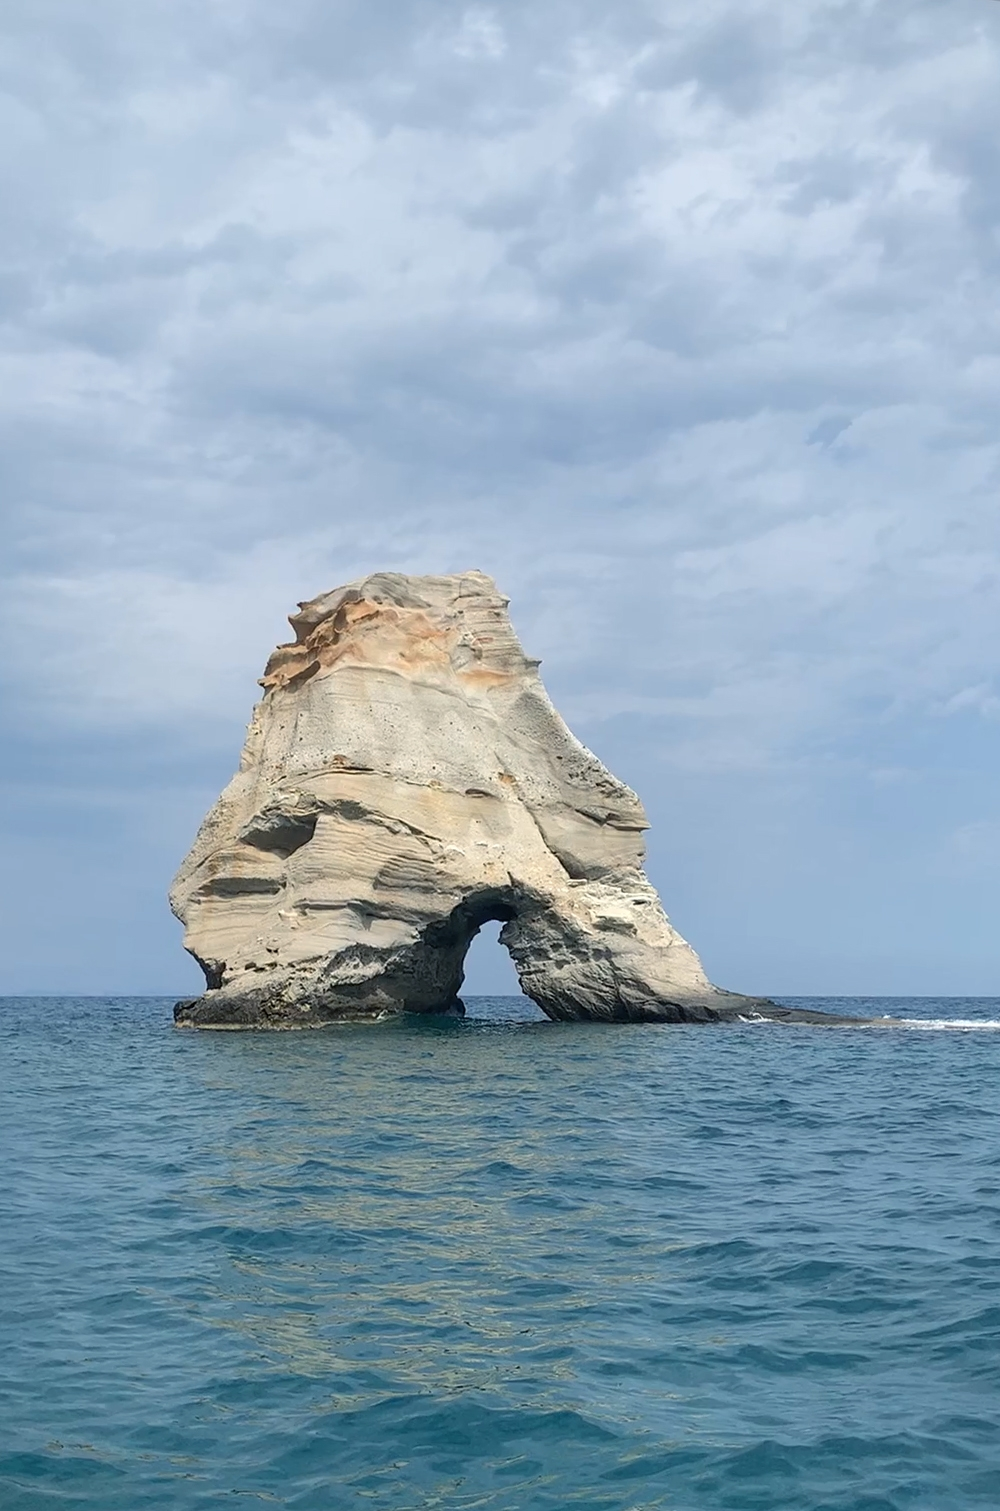 A single pale rock arch in the sea.